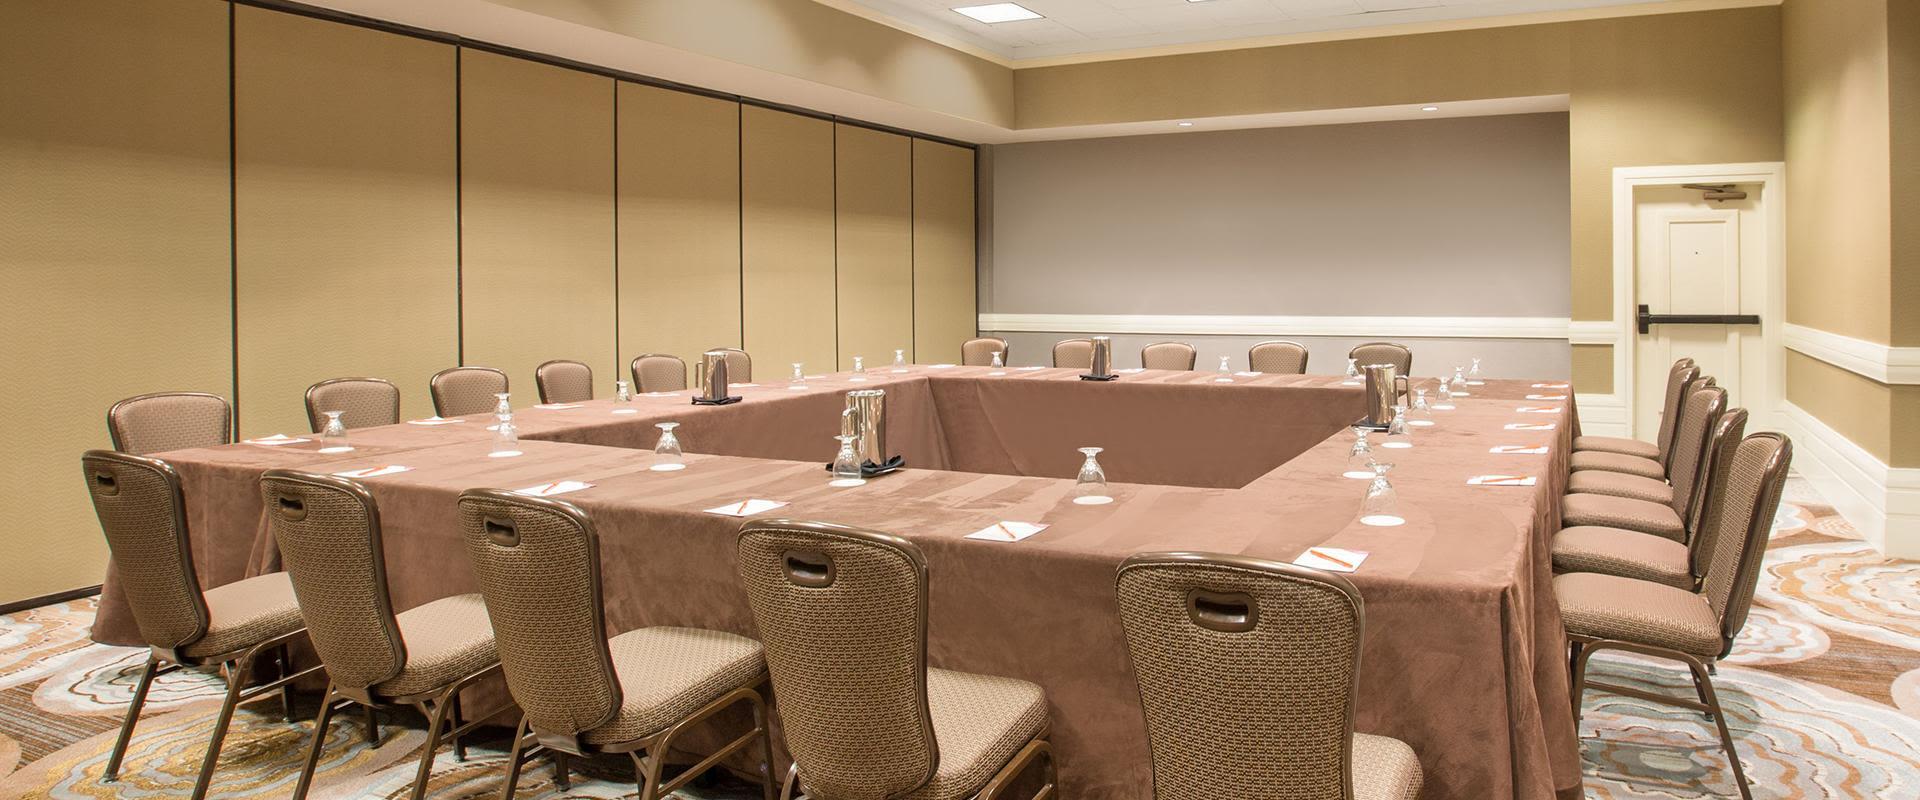 Redondo Beach Meeting Room Square Table